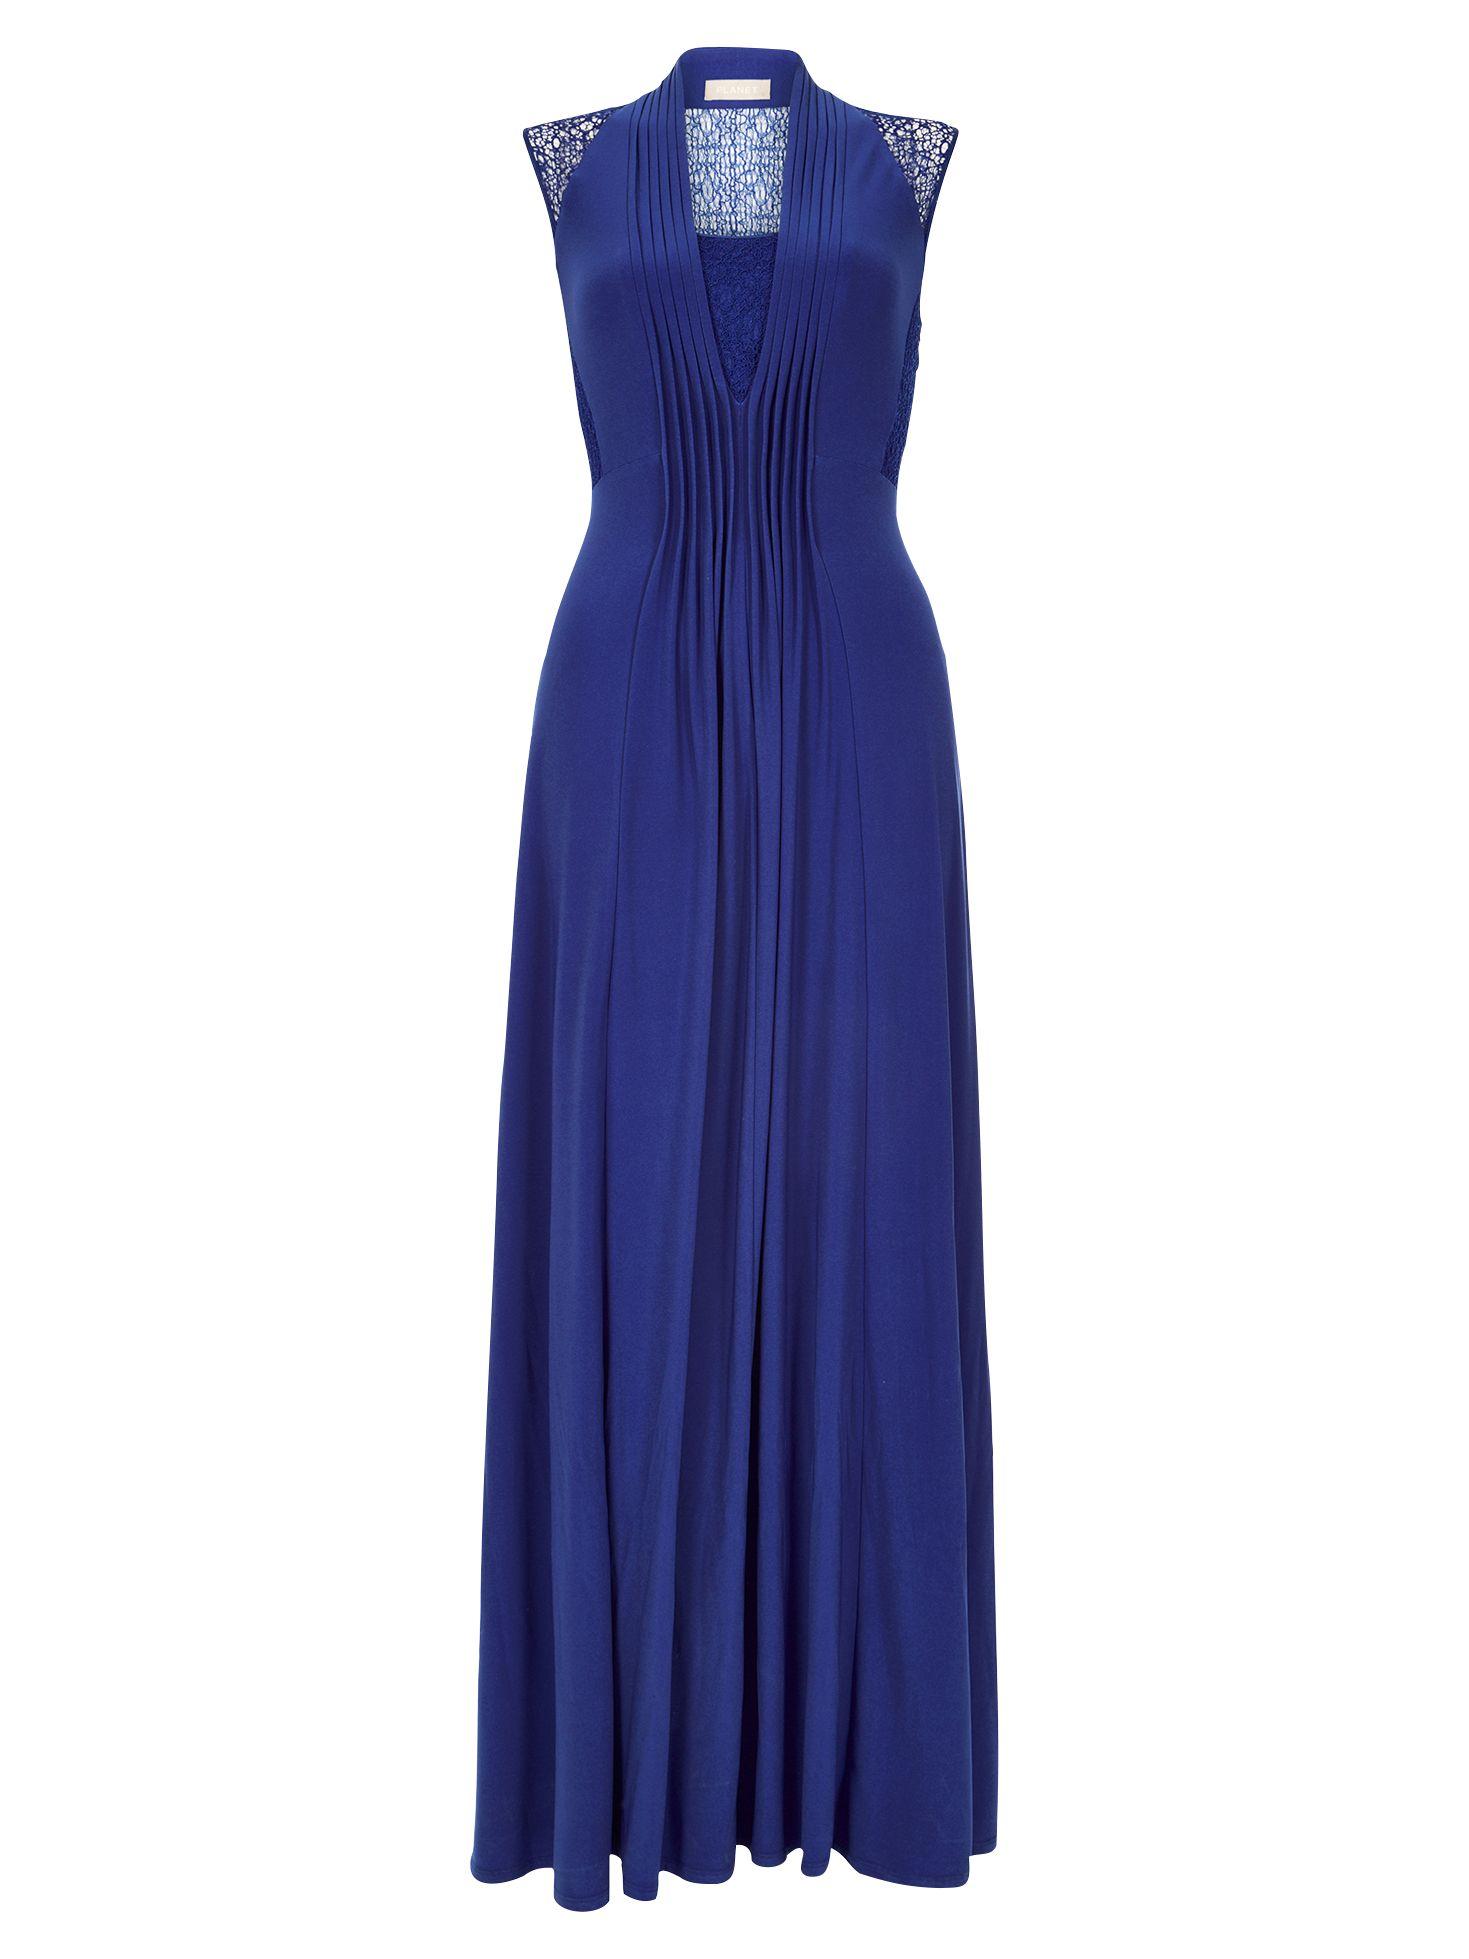 planet maxi dress mid blue, planet, maxi, dress, mid, blue, 14|20|16|18|8|12|10, women, plus size, womens dresses, gifts, wedding, wedding clothing, adult bridesmaids, 1905561